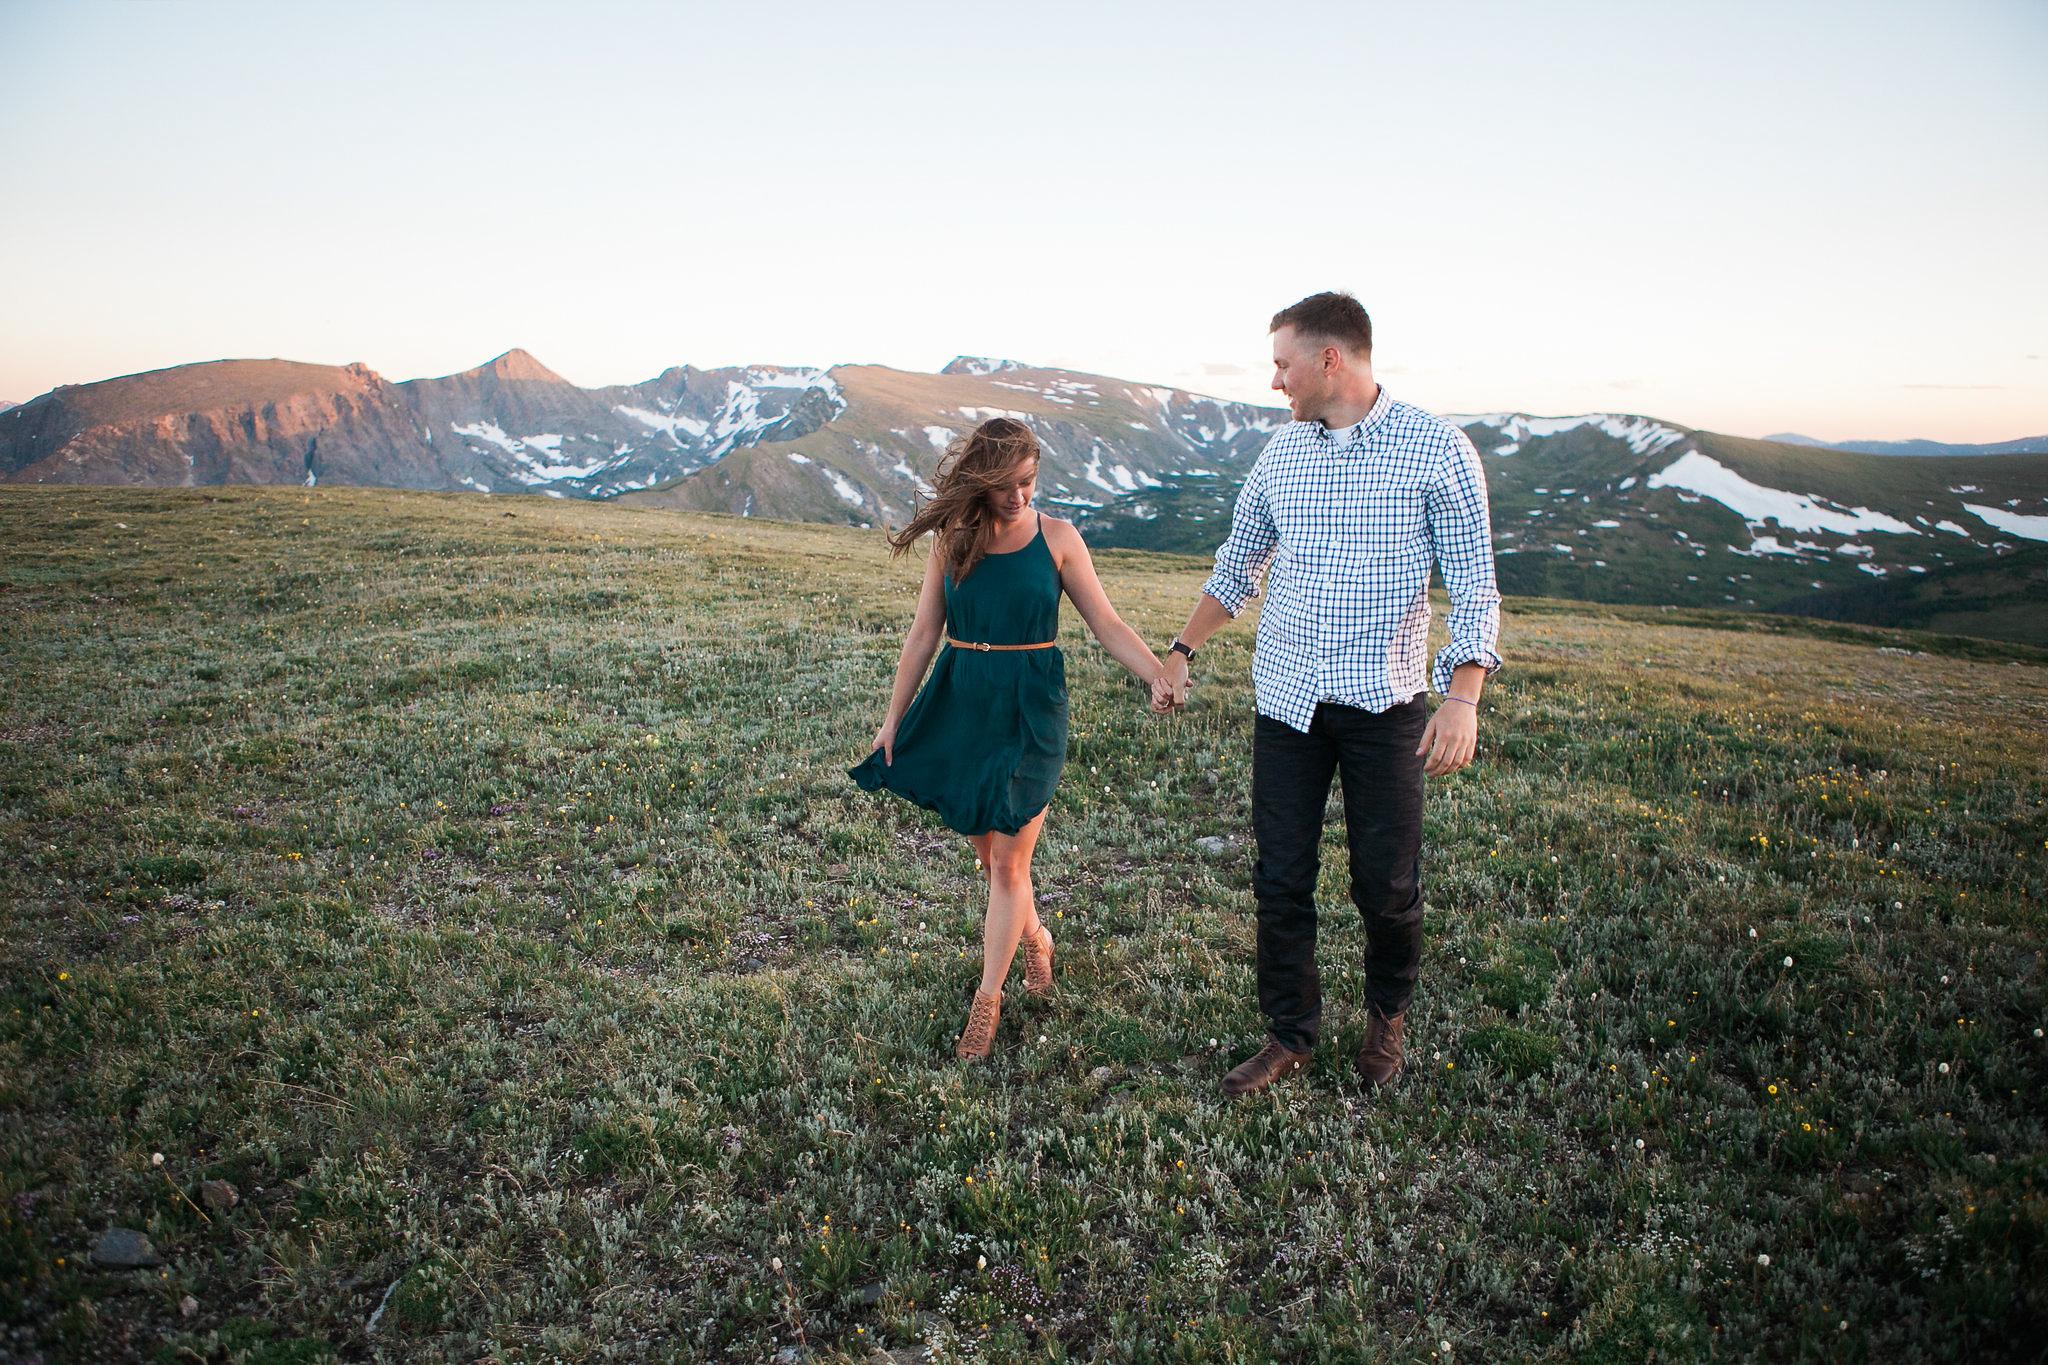 Rocky-Mountain-National-Park-engagement_046.jpg